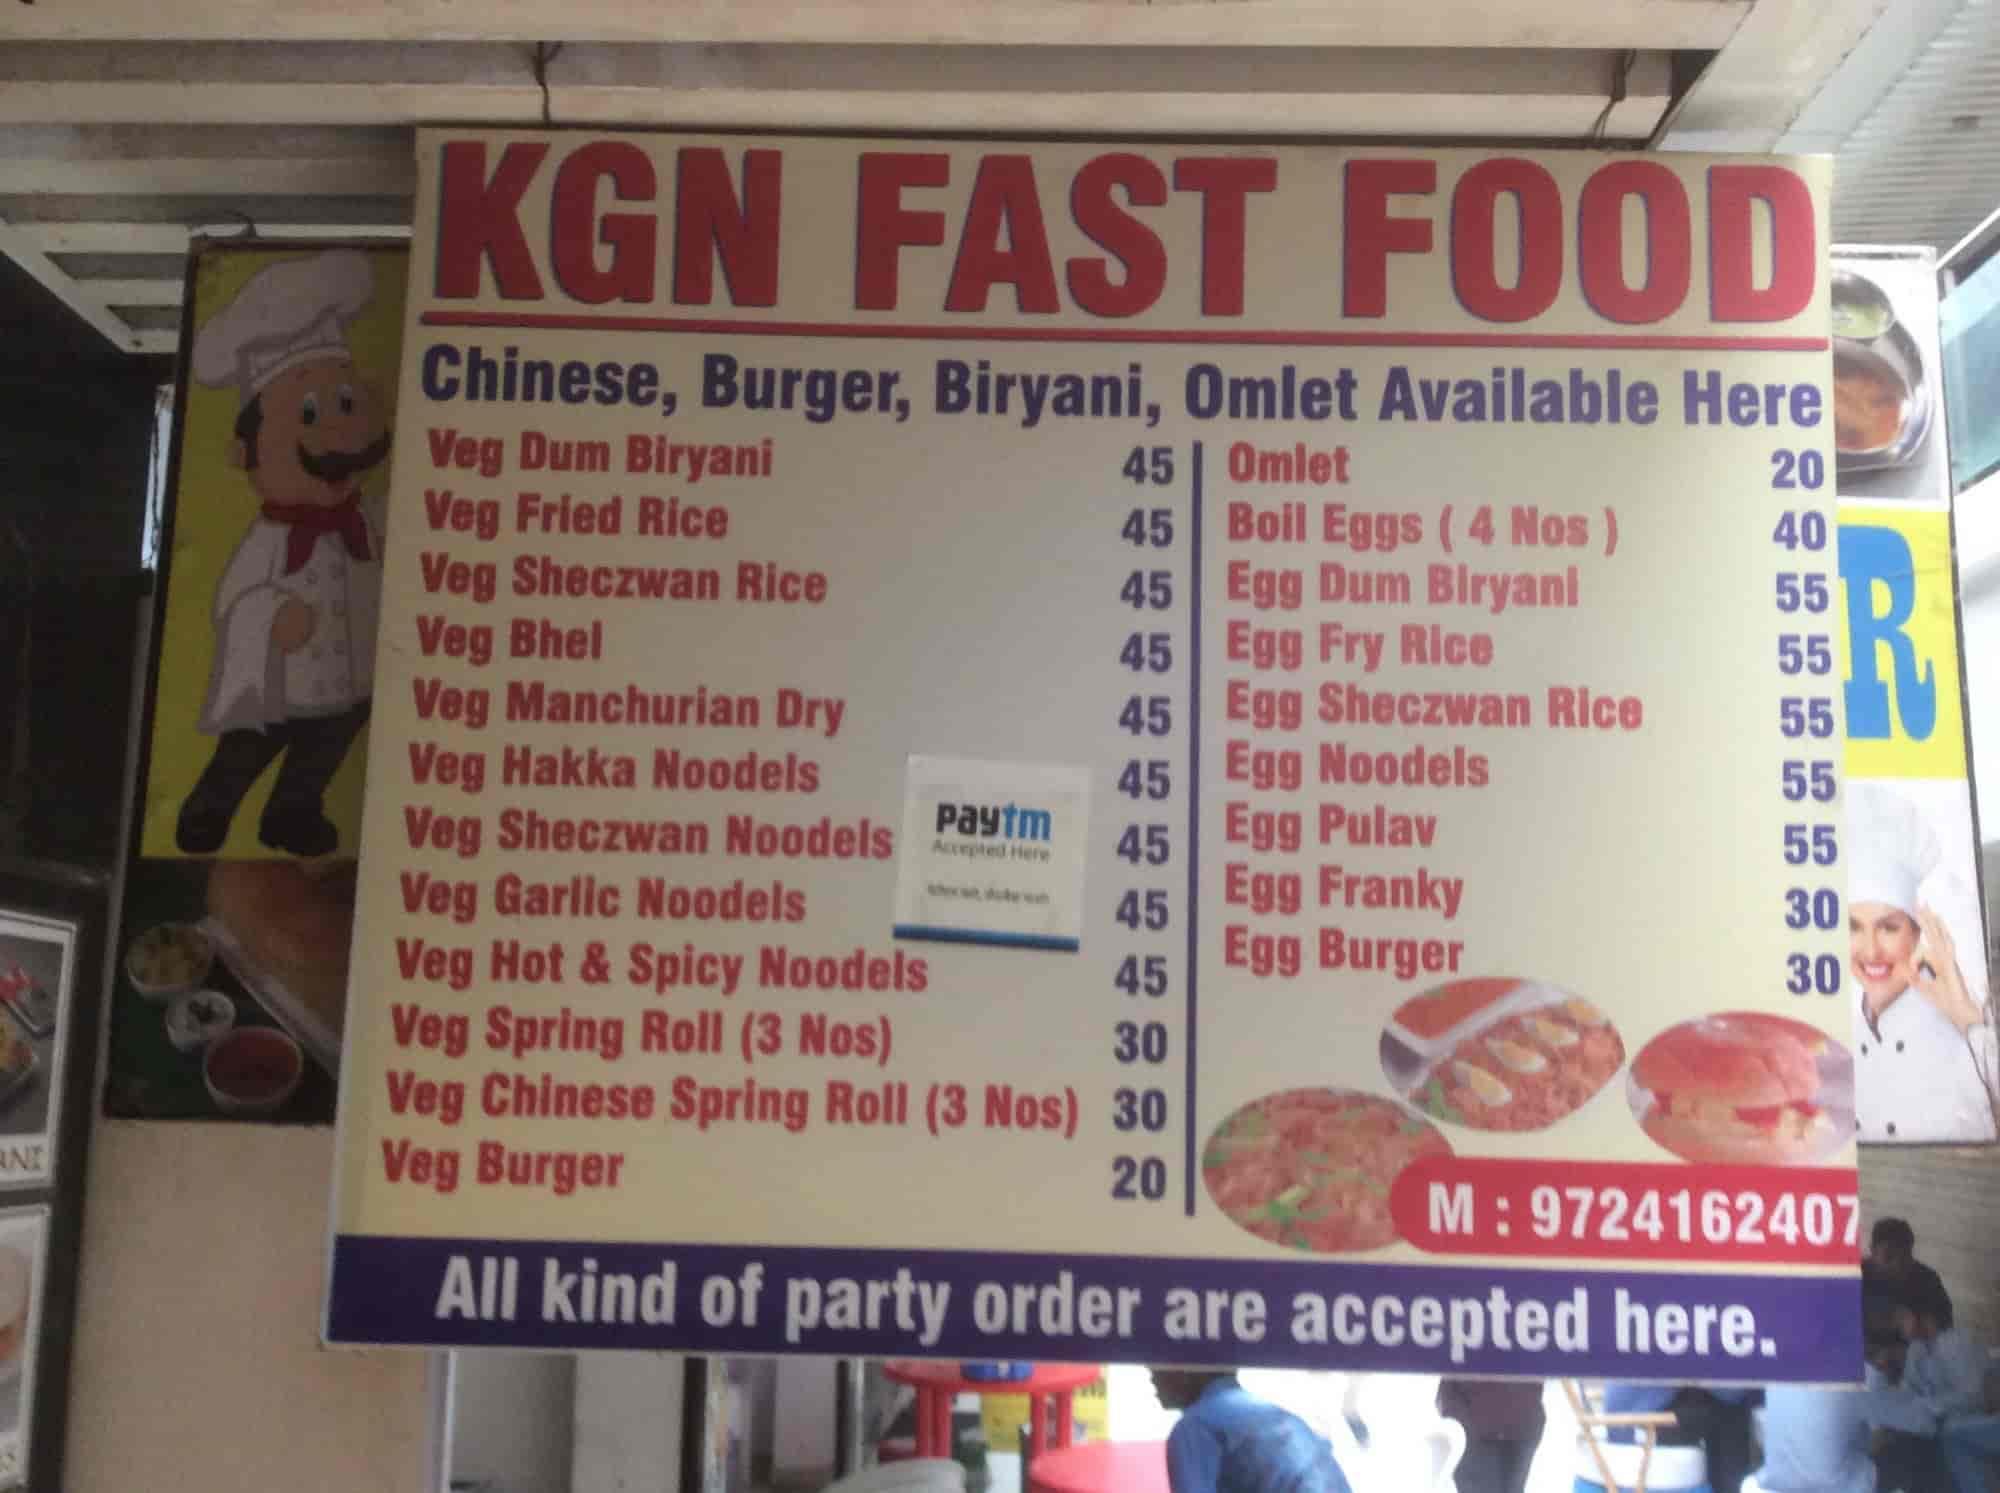 Kgn Fast Food Genda Circle Vadodara Chinese Biryani Mughlai North Indian Fast Food Street Food Cuisine Restaurant Justdial